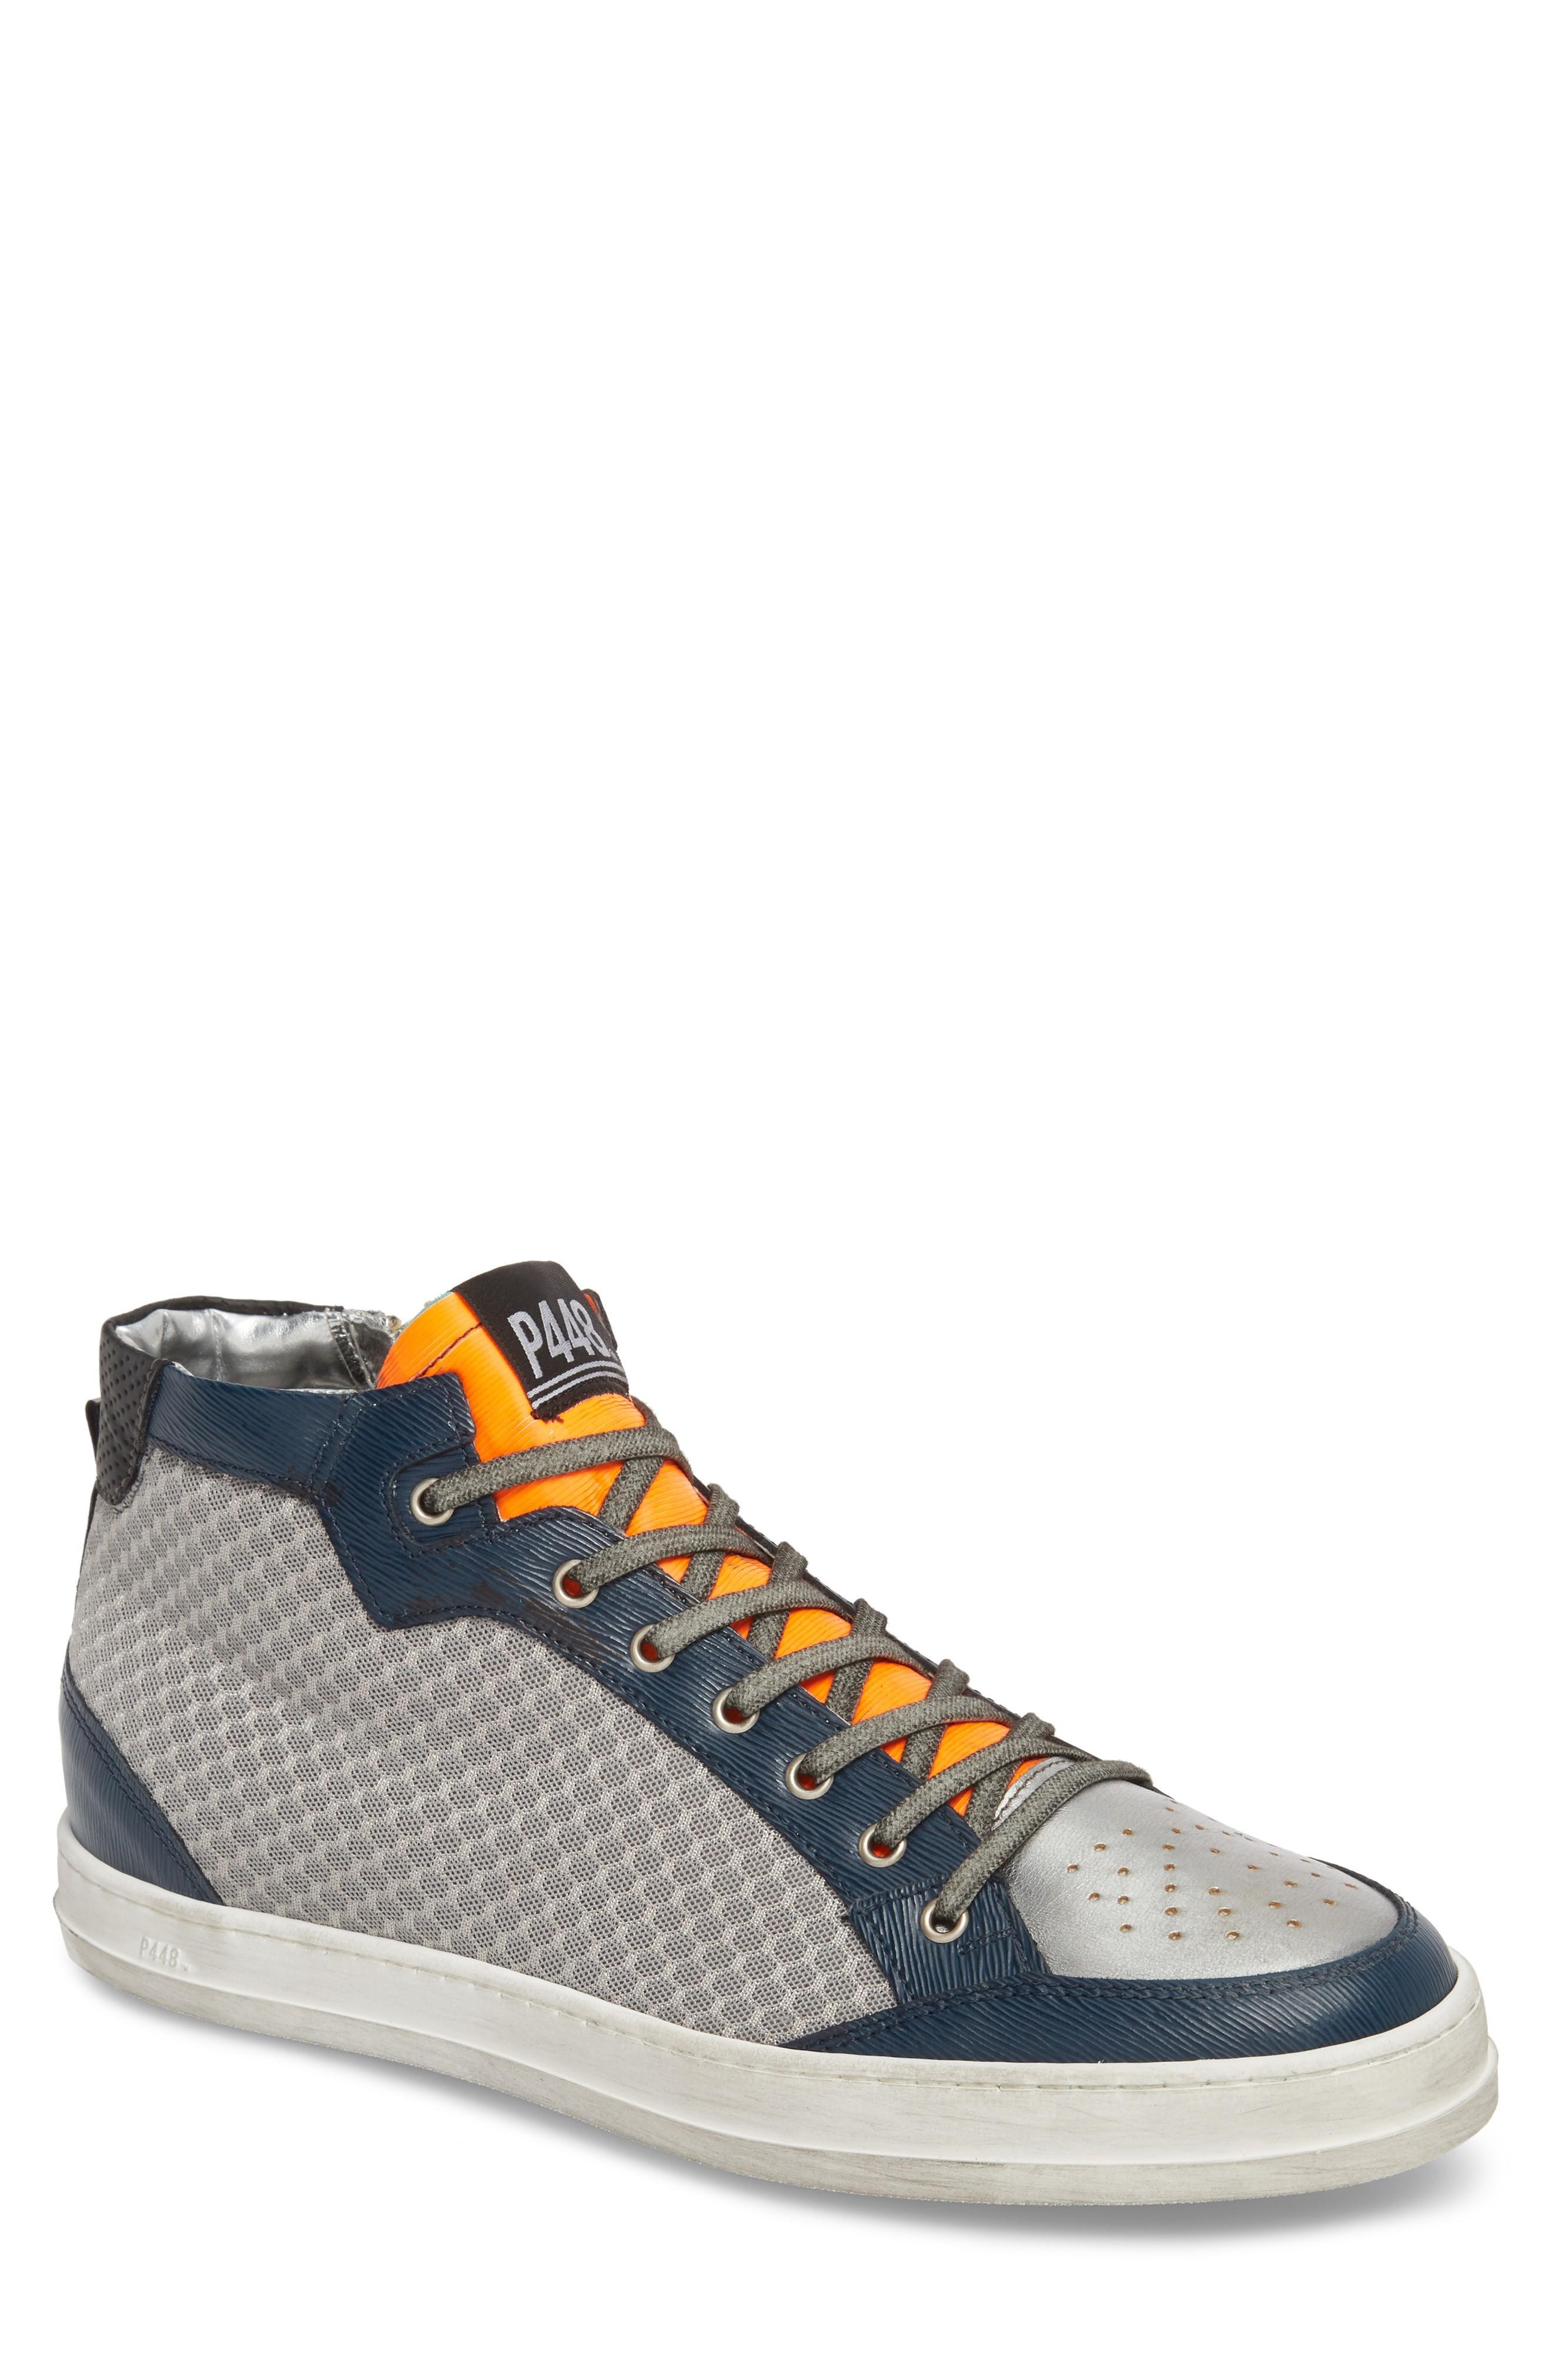 P448 High Top Tech Mesh Sneakers In Grey Tec